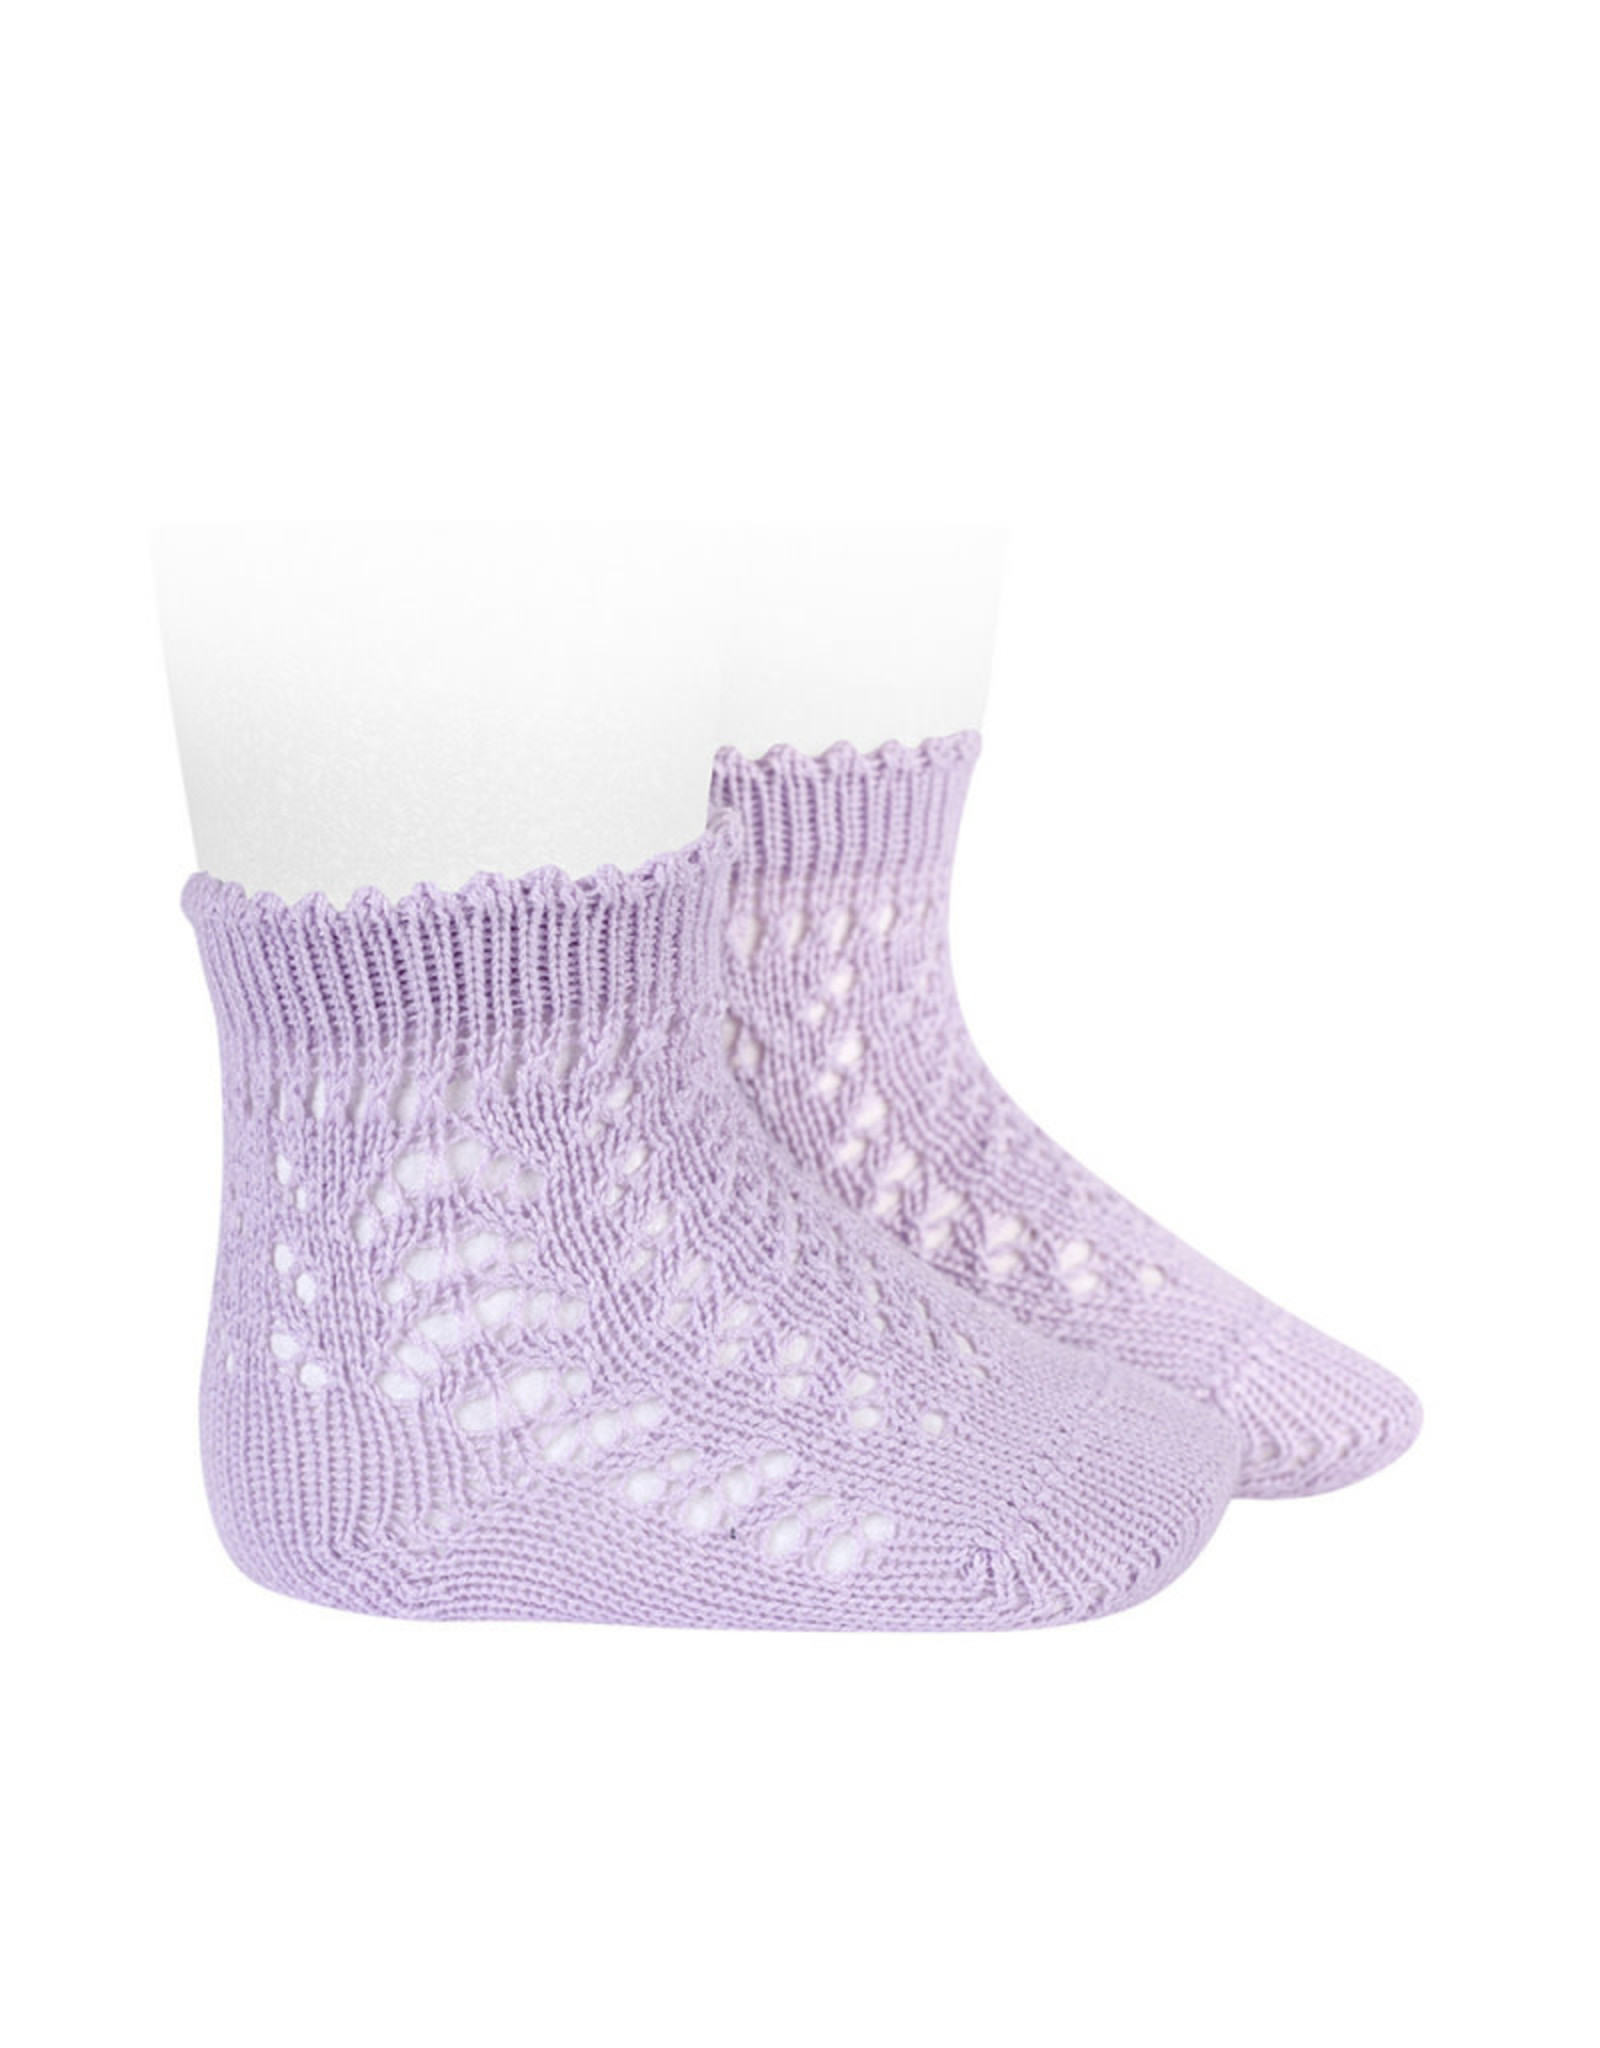 CONDOR Mauve Short Openwork Socks